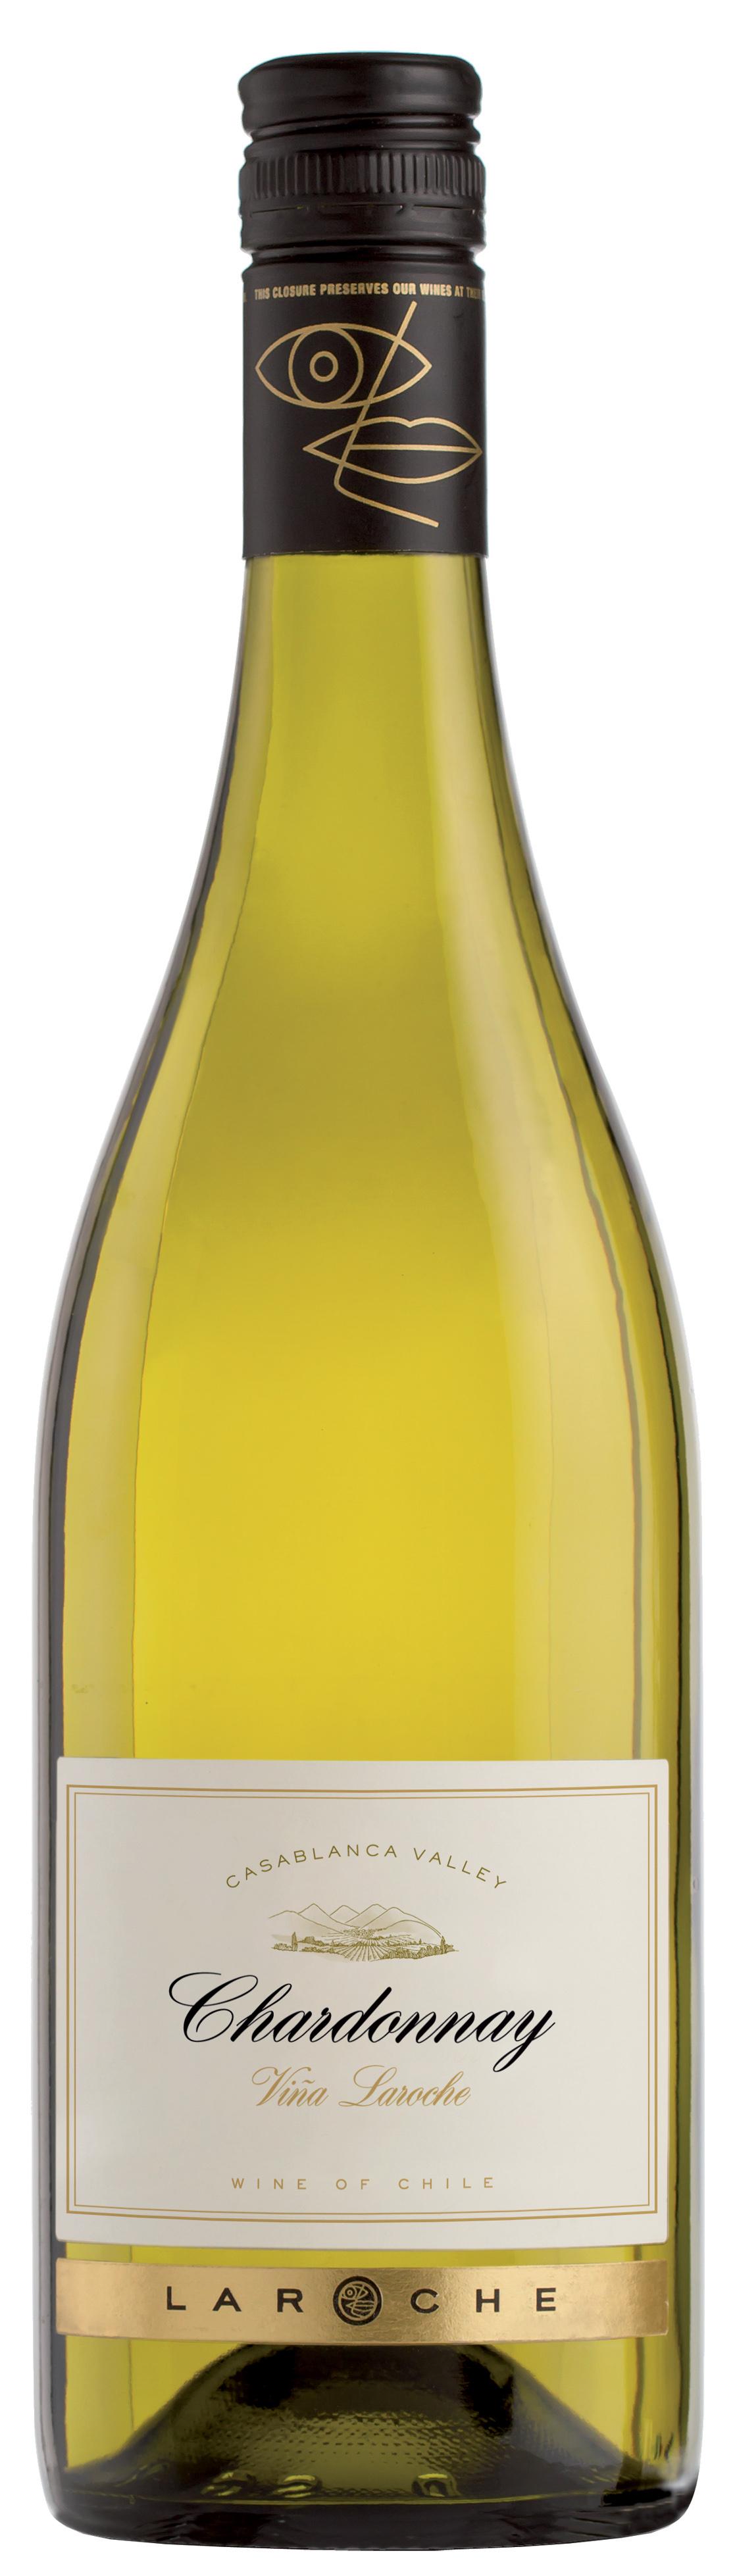 Laroche Chardonnay BY Viña Laroche